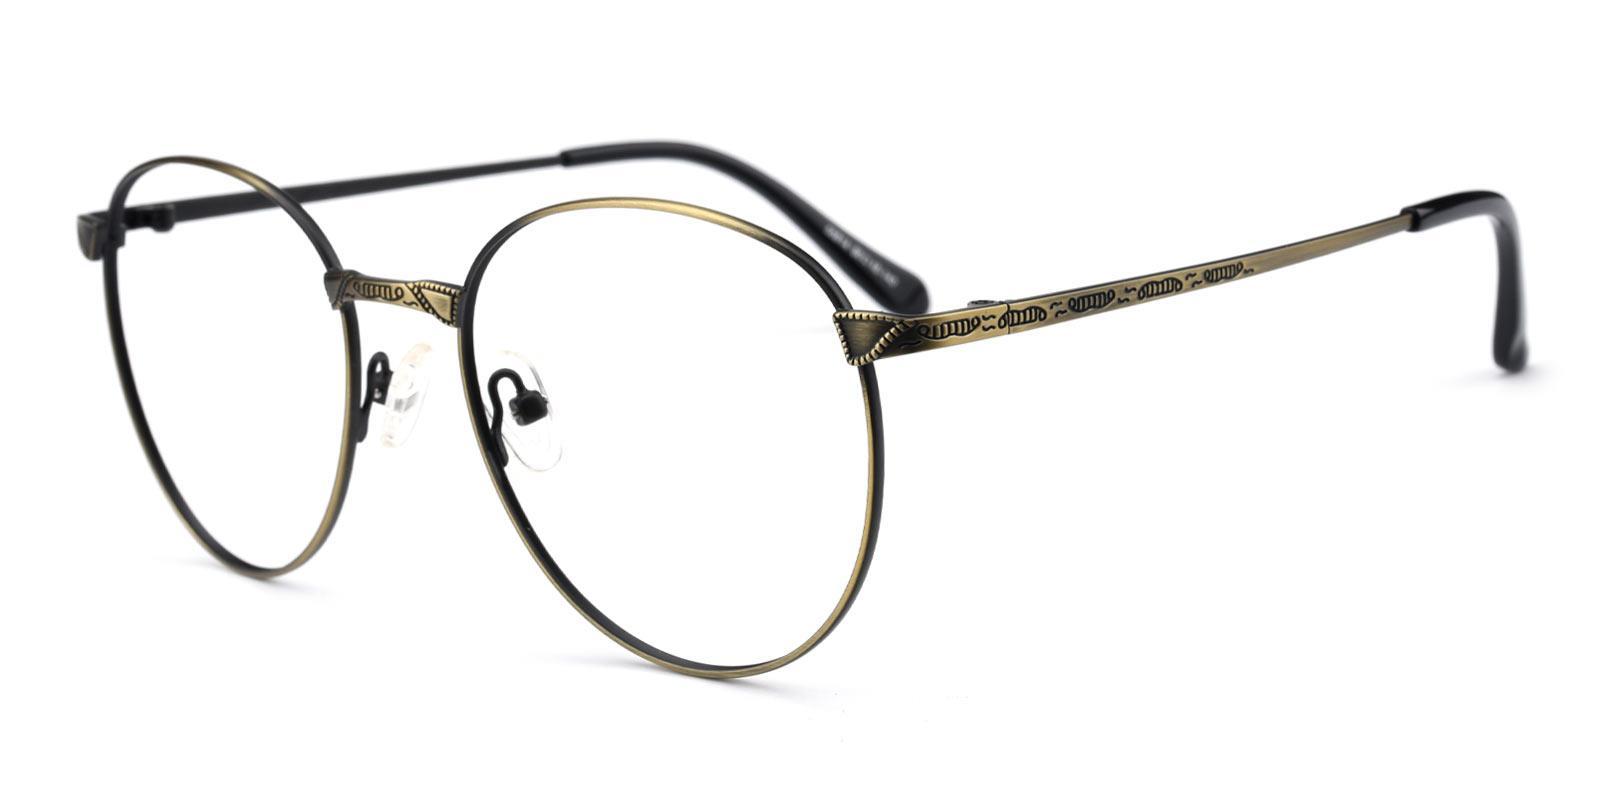 Camp-Gold-Round-Metal-Eyeglasses-additional1